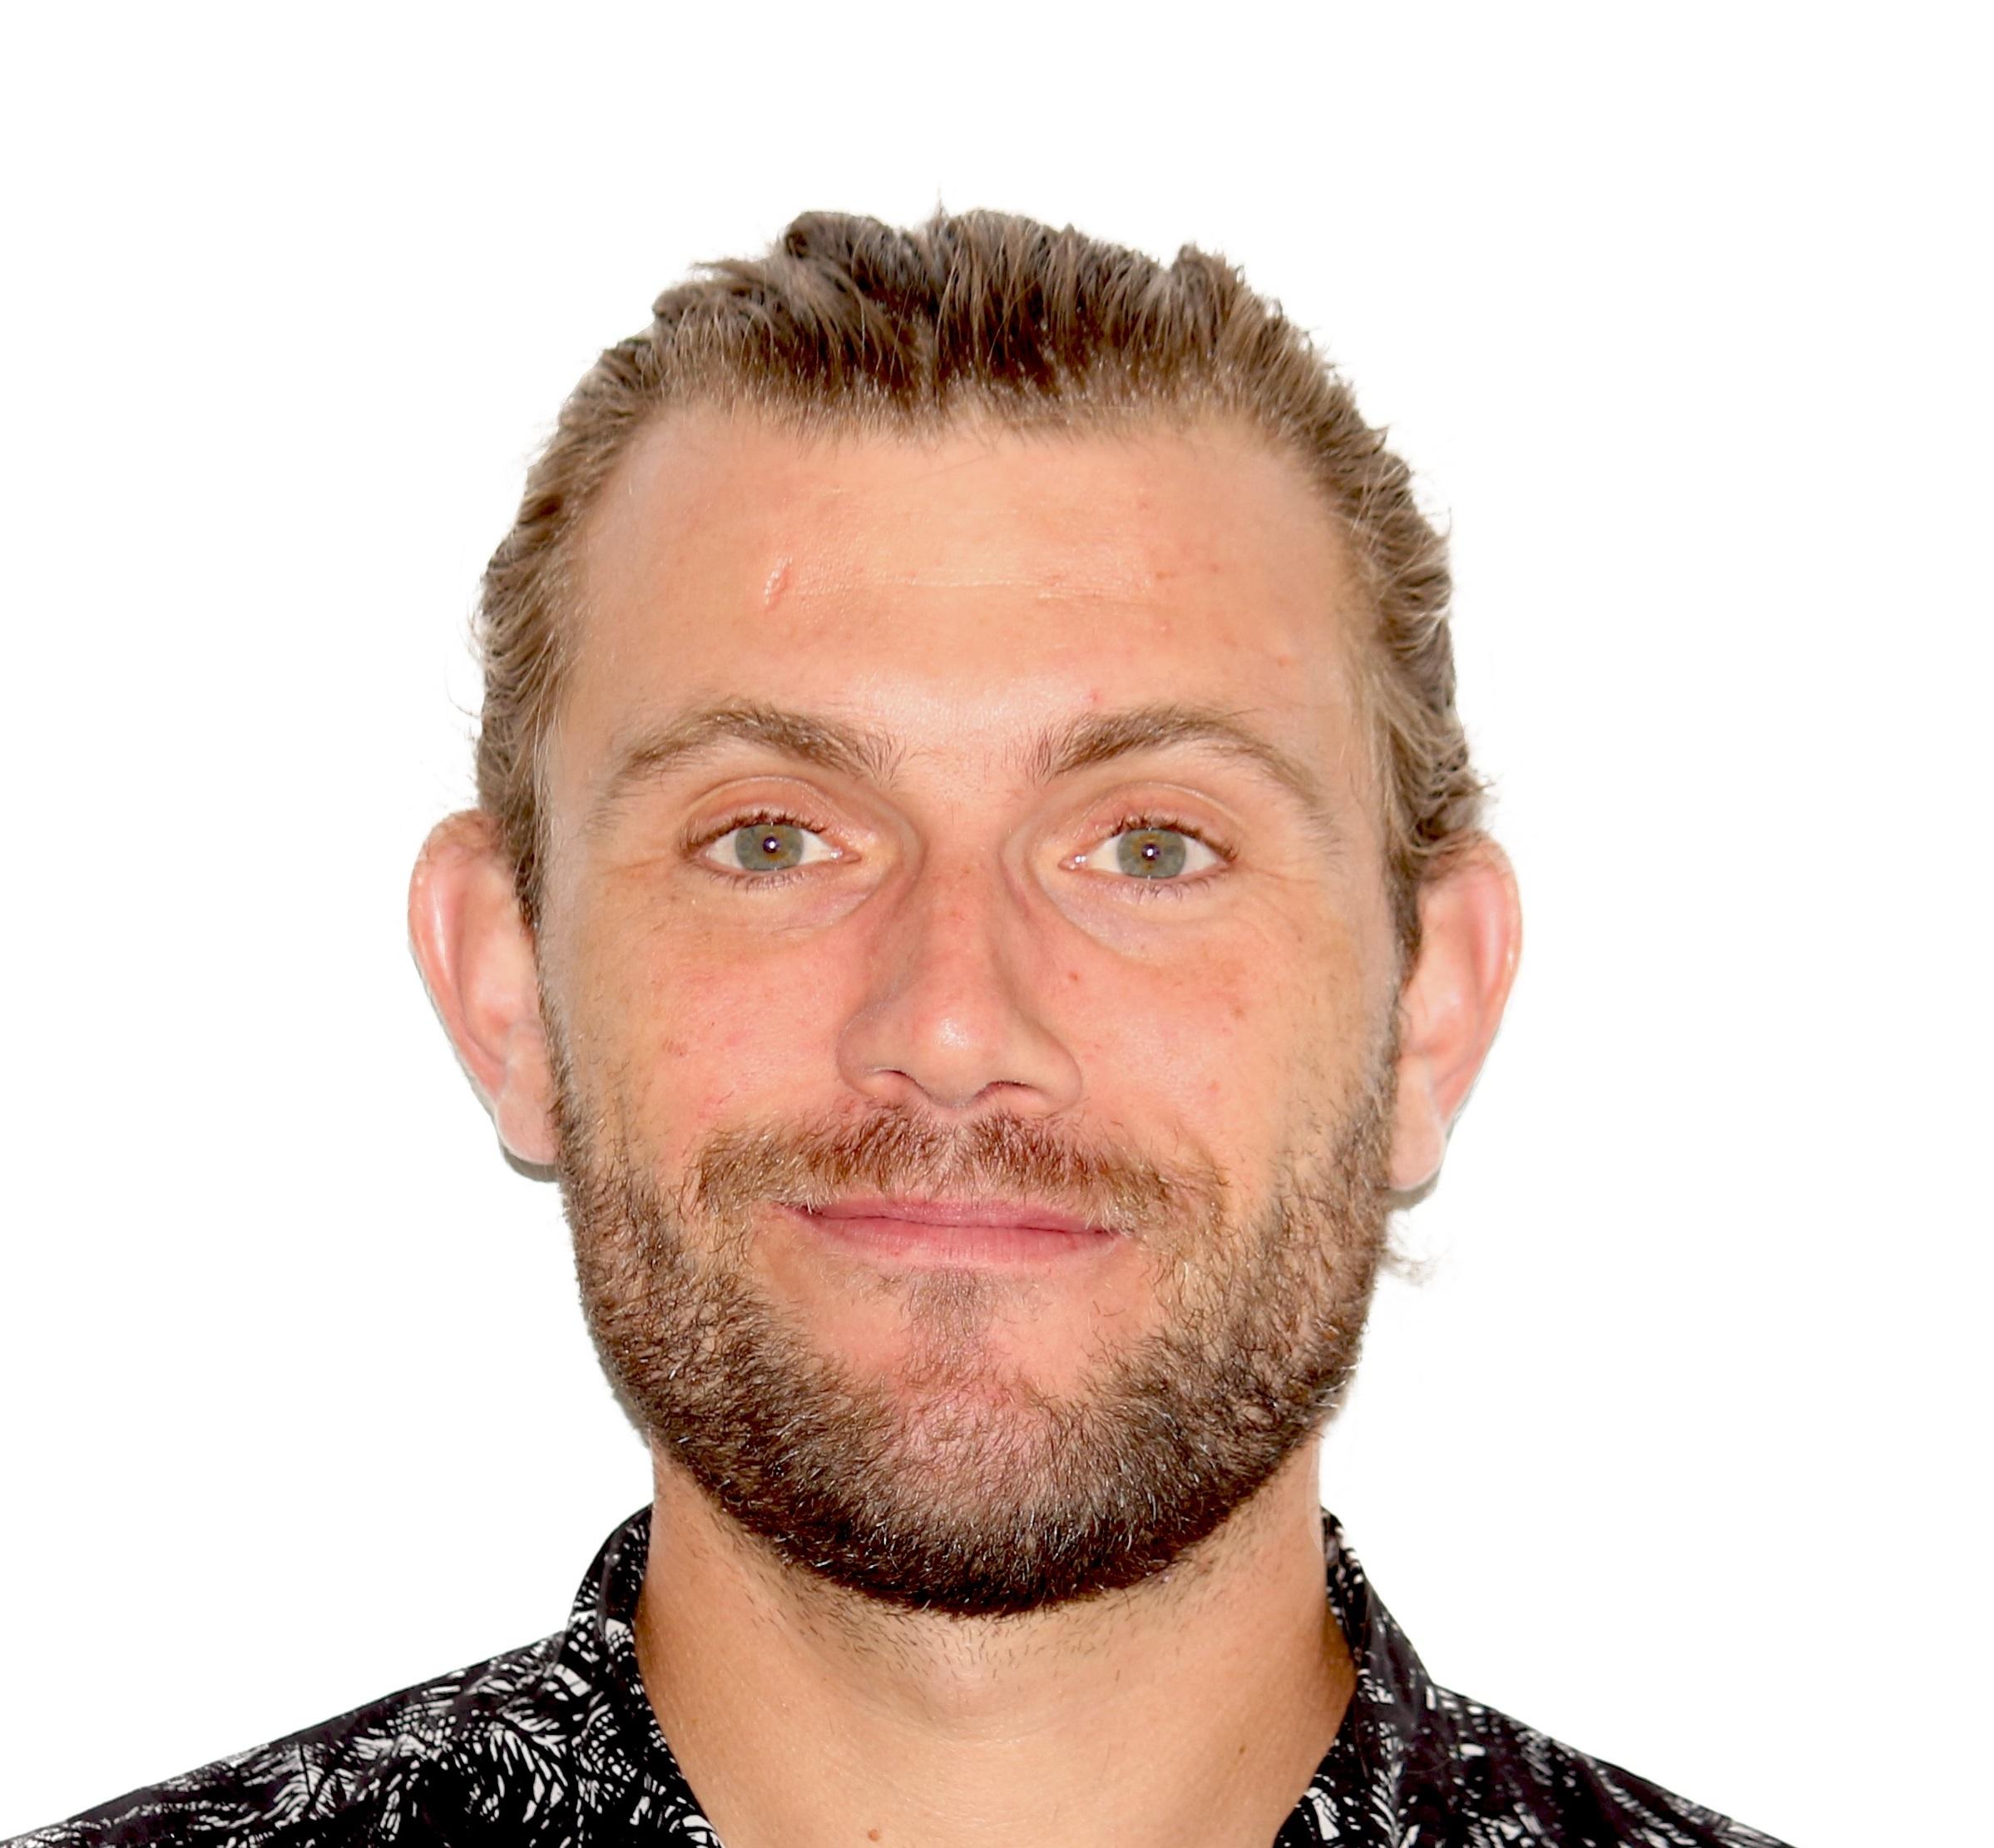 Xavier Teychenné